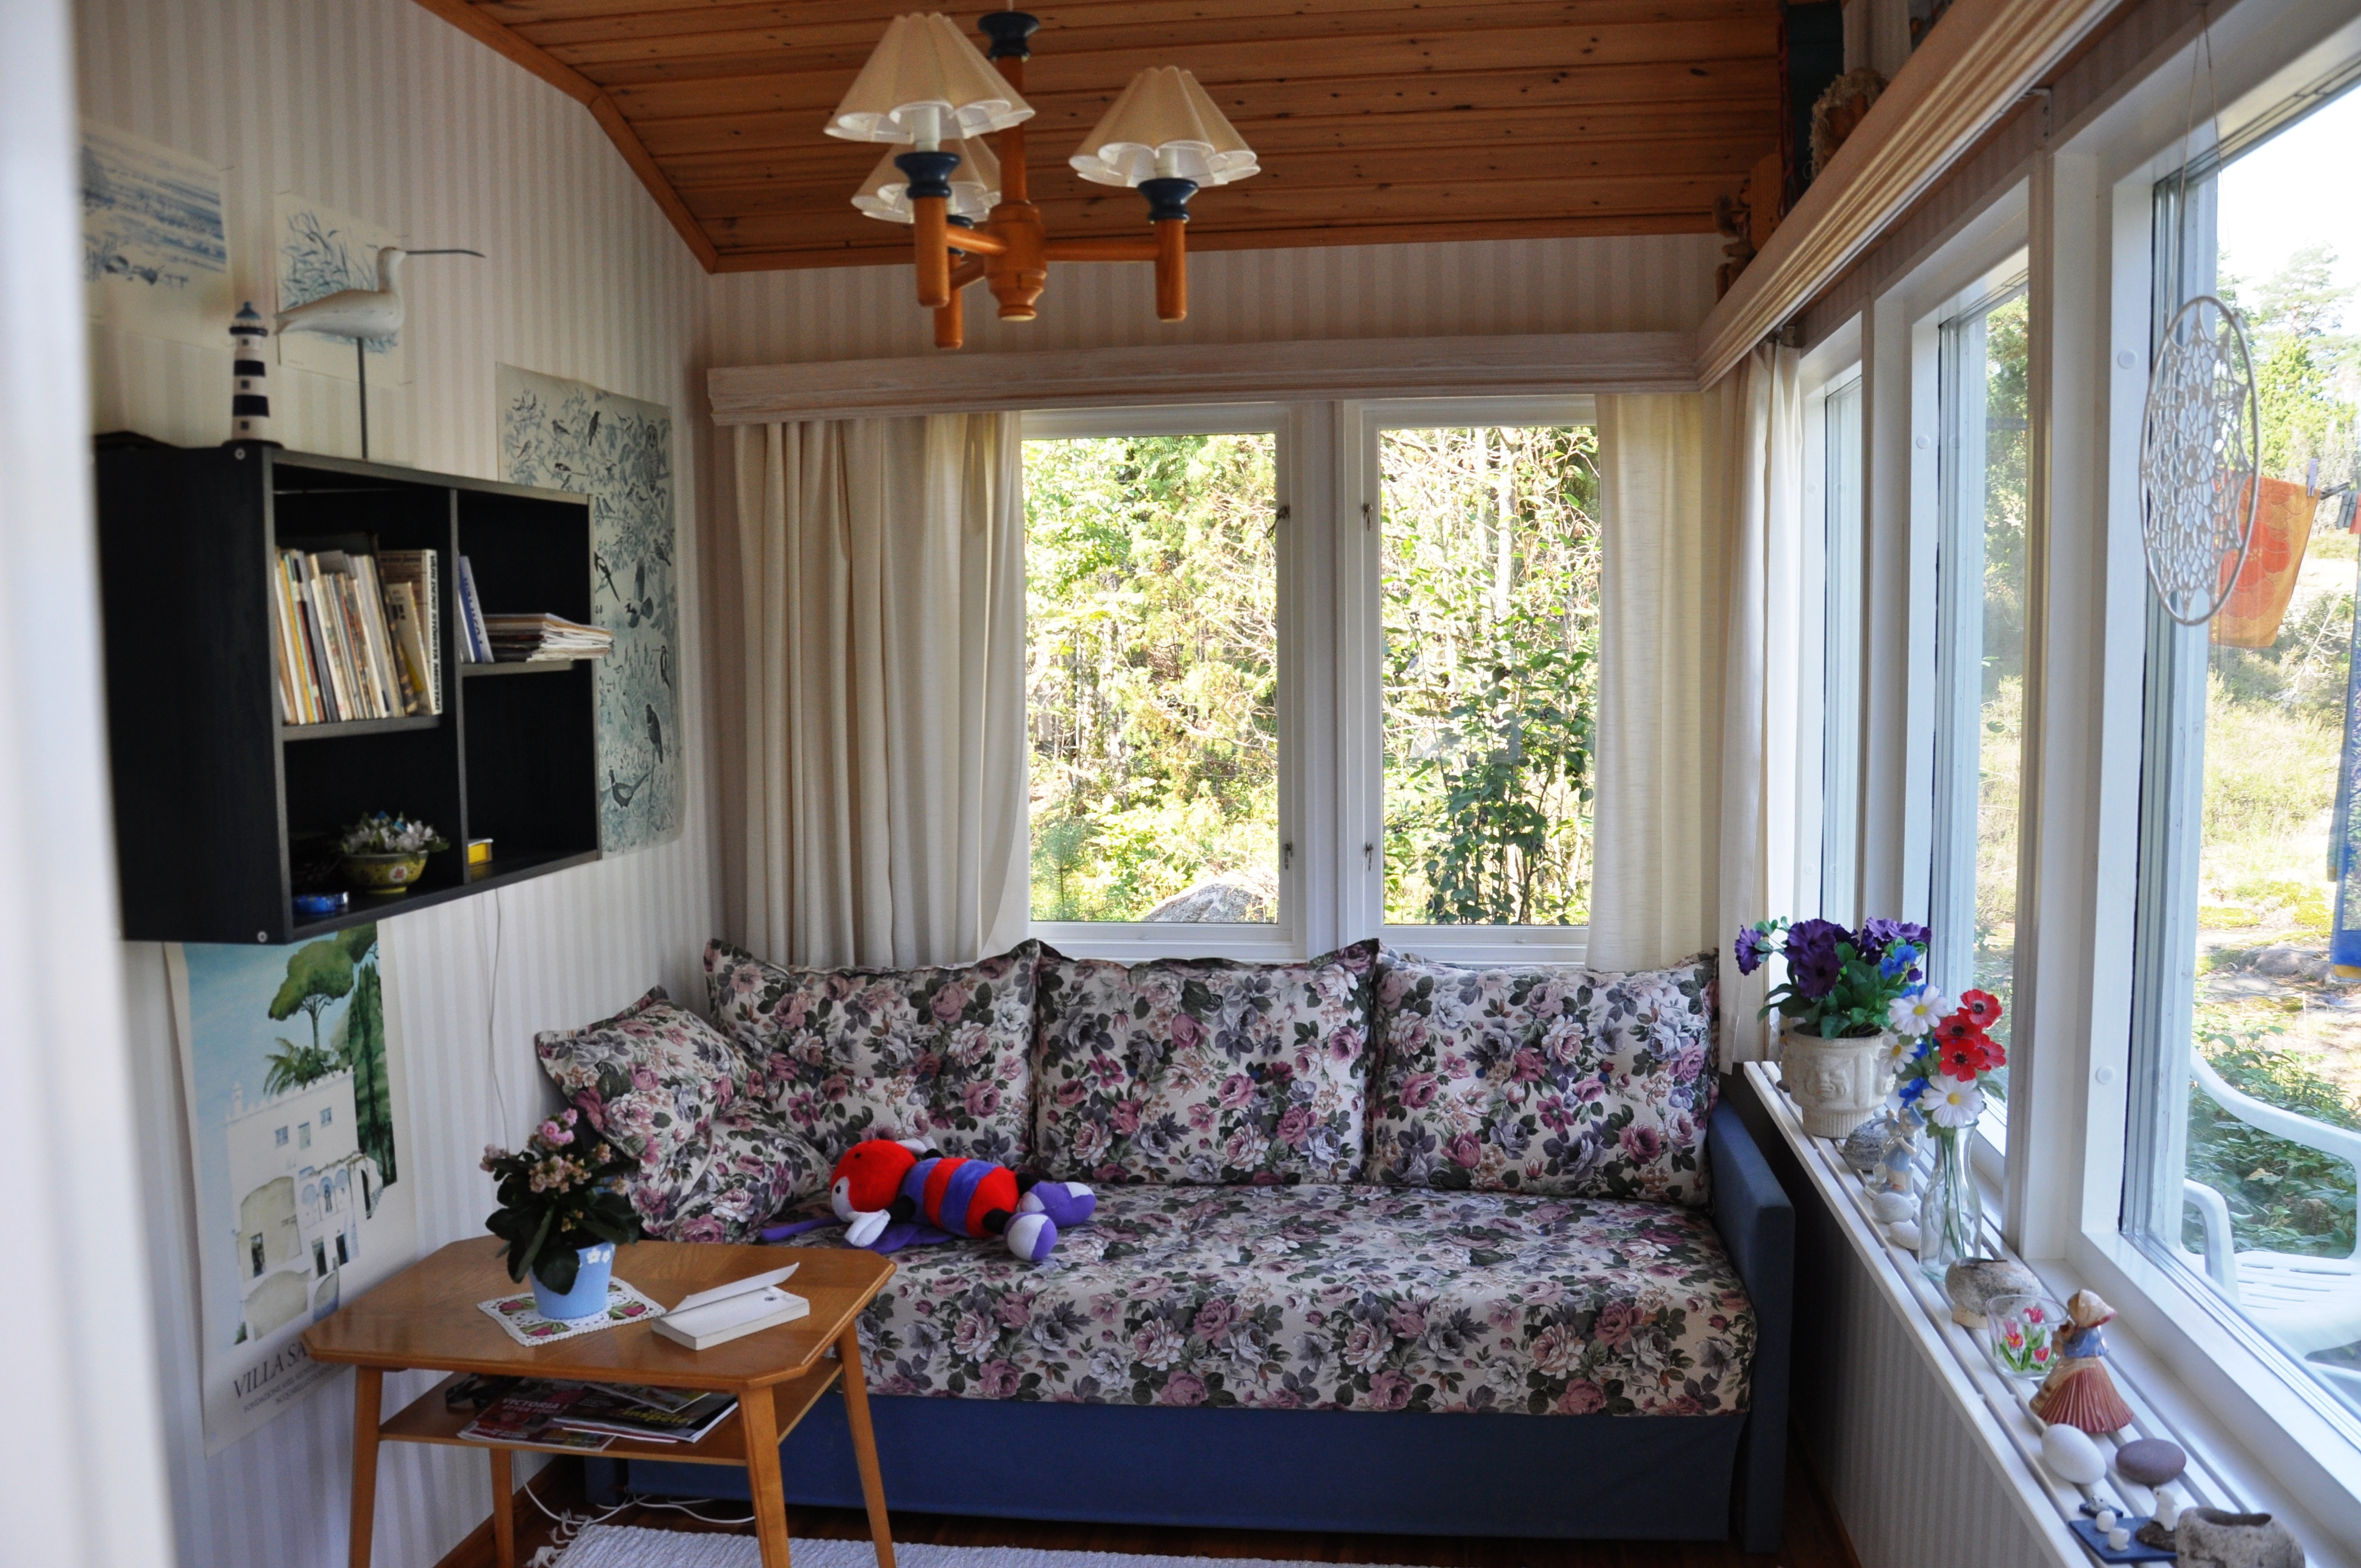 Holiday home sweden, Östergötland, 615 92 valdemarsvik ...